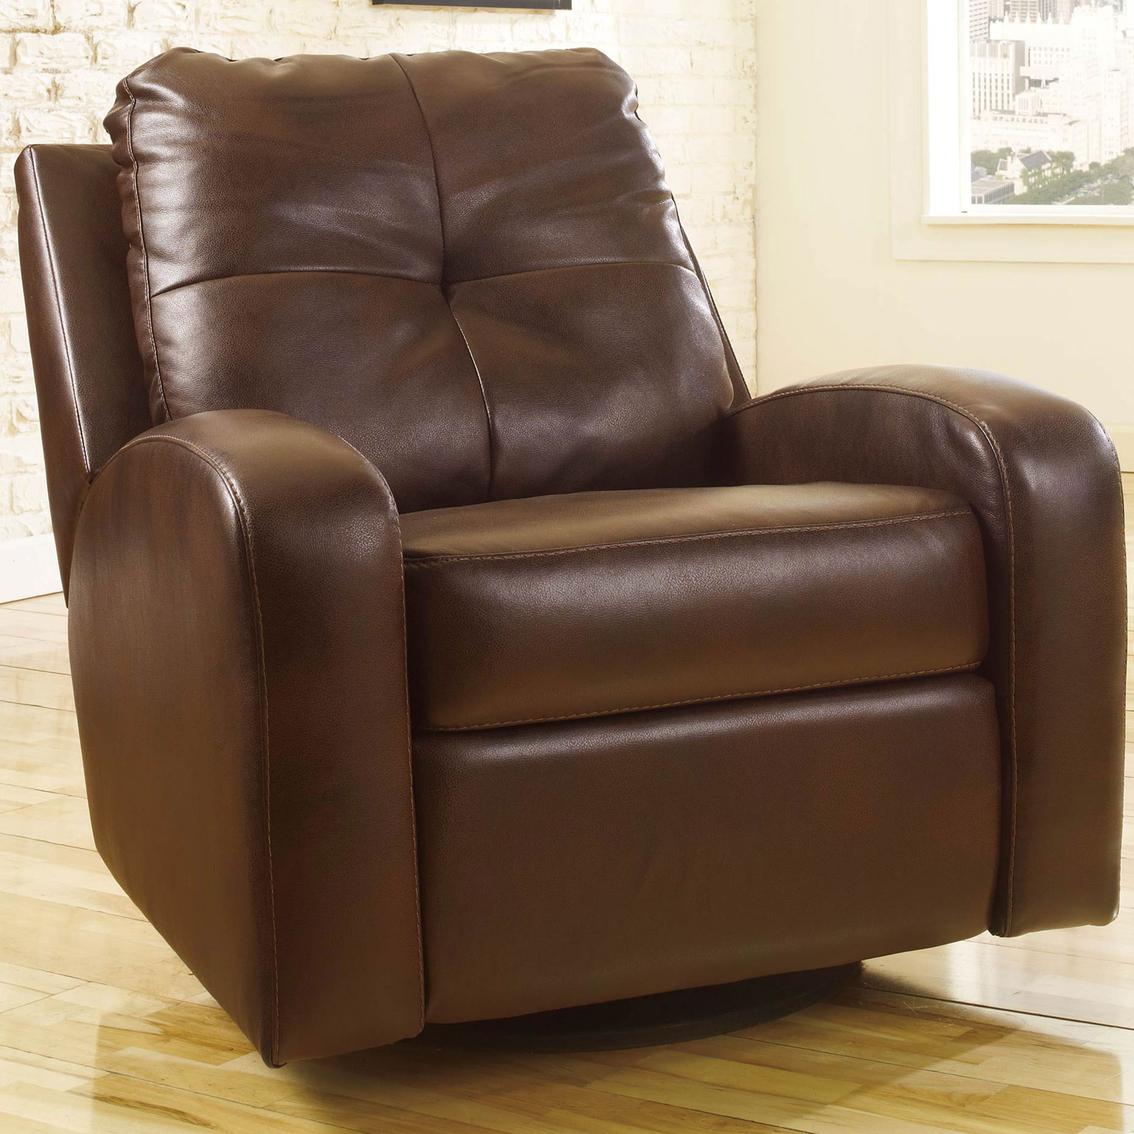 ashley furniture lift chair pvc pipe mannix swivel glider recliner recliners